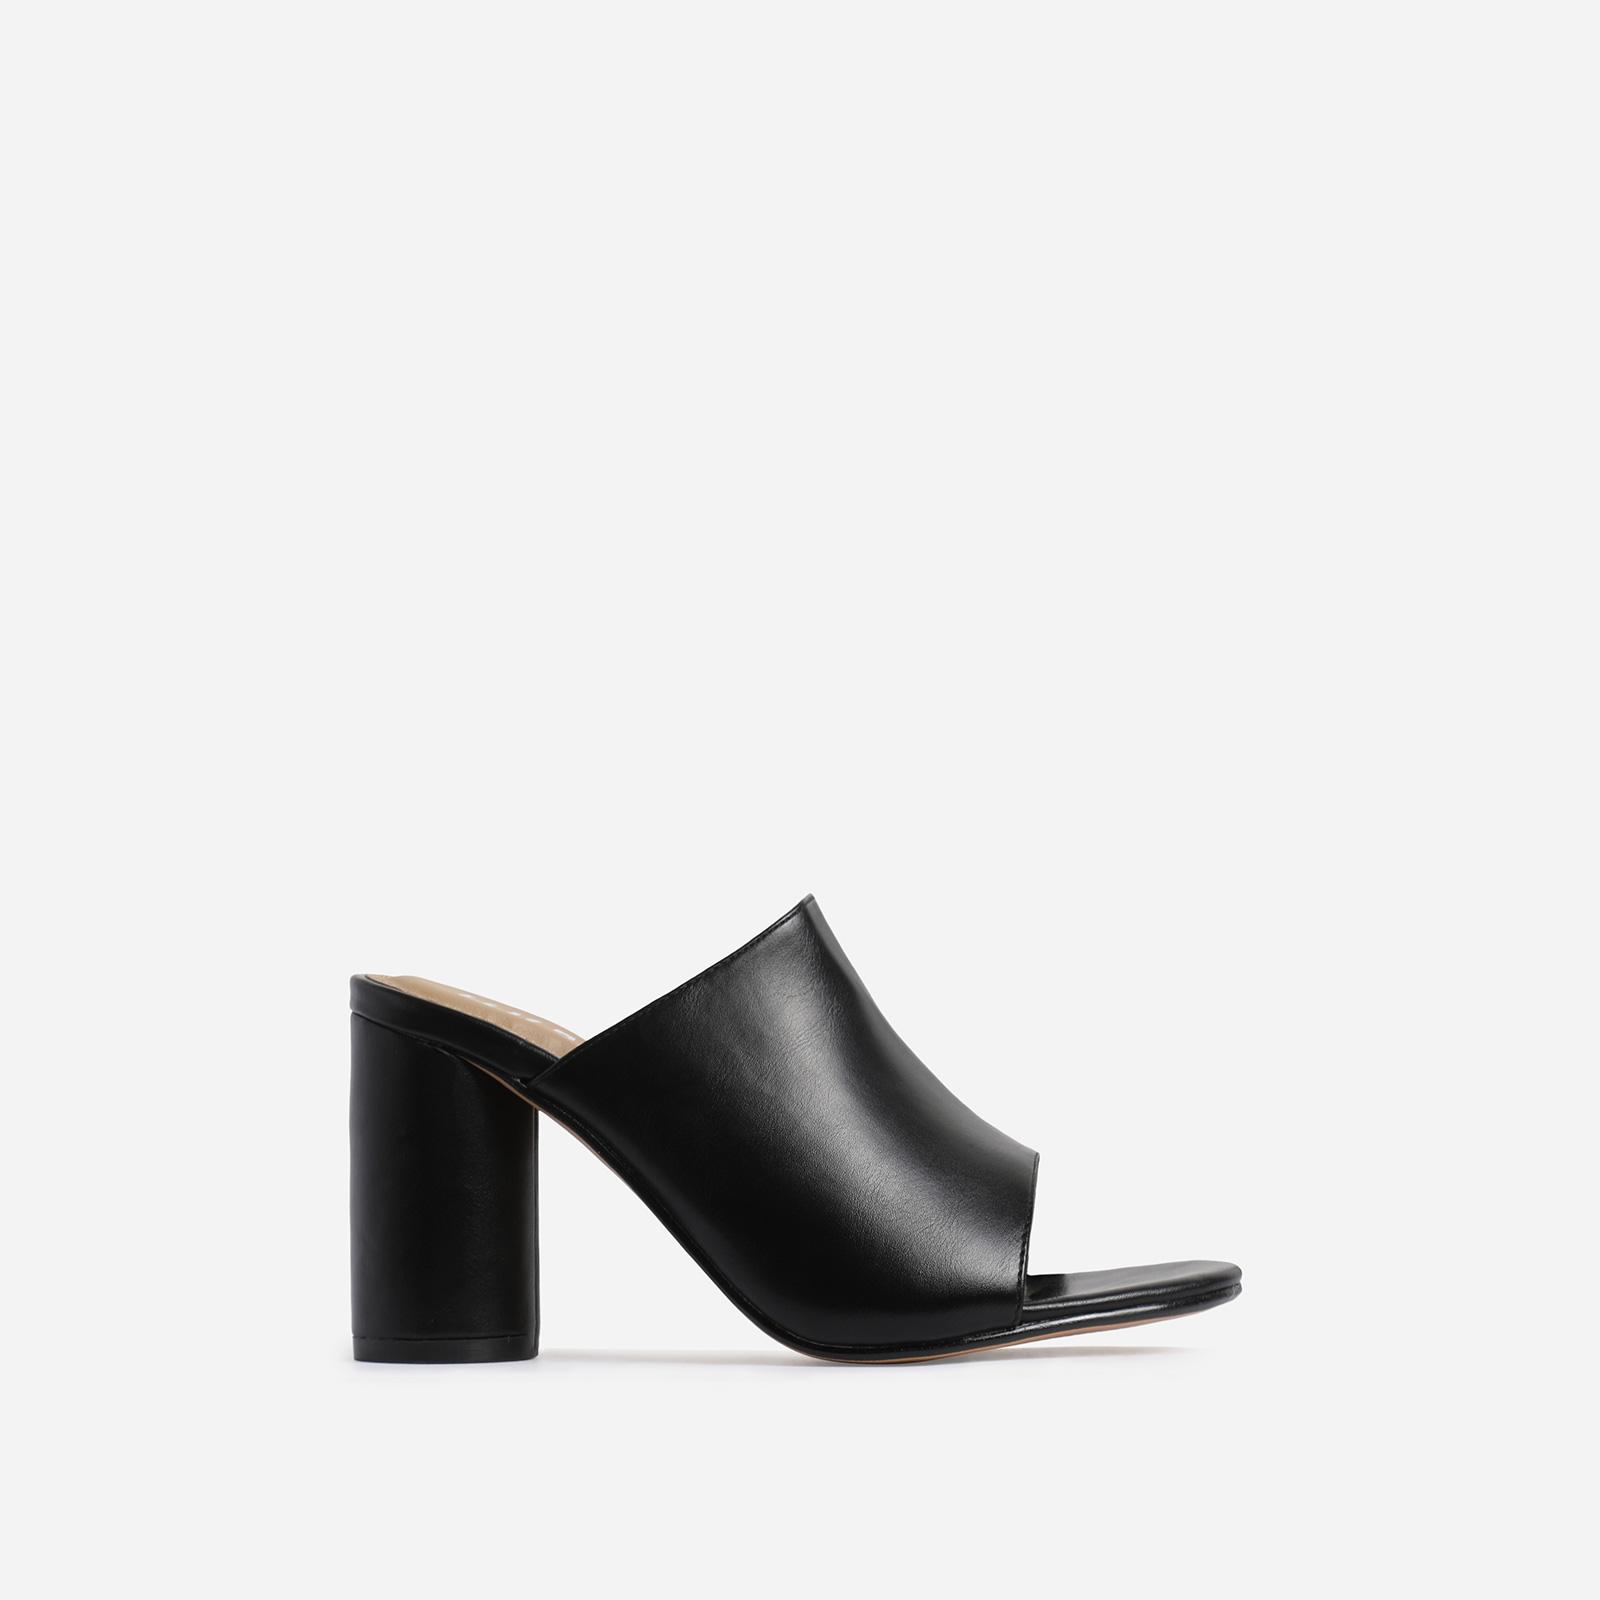 Virgo Peep Toe Block Heel Mule In Black Faux Leather